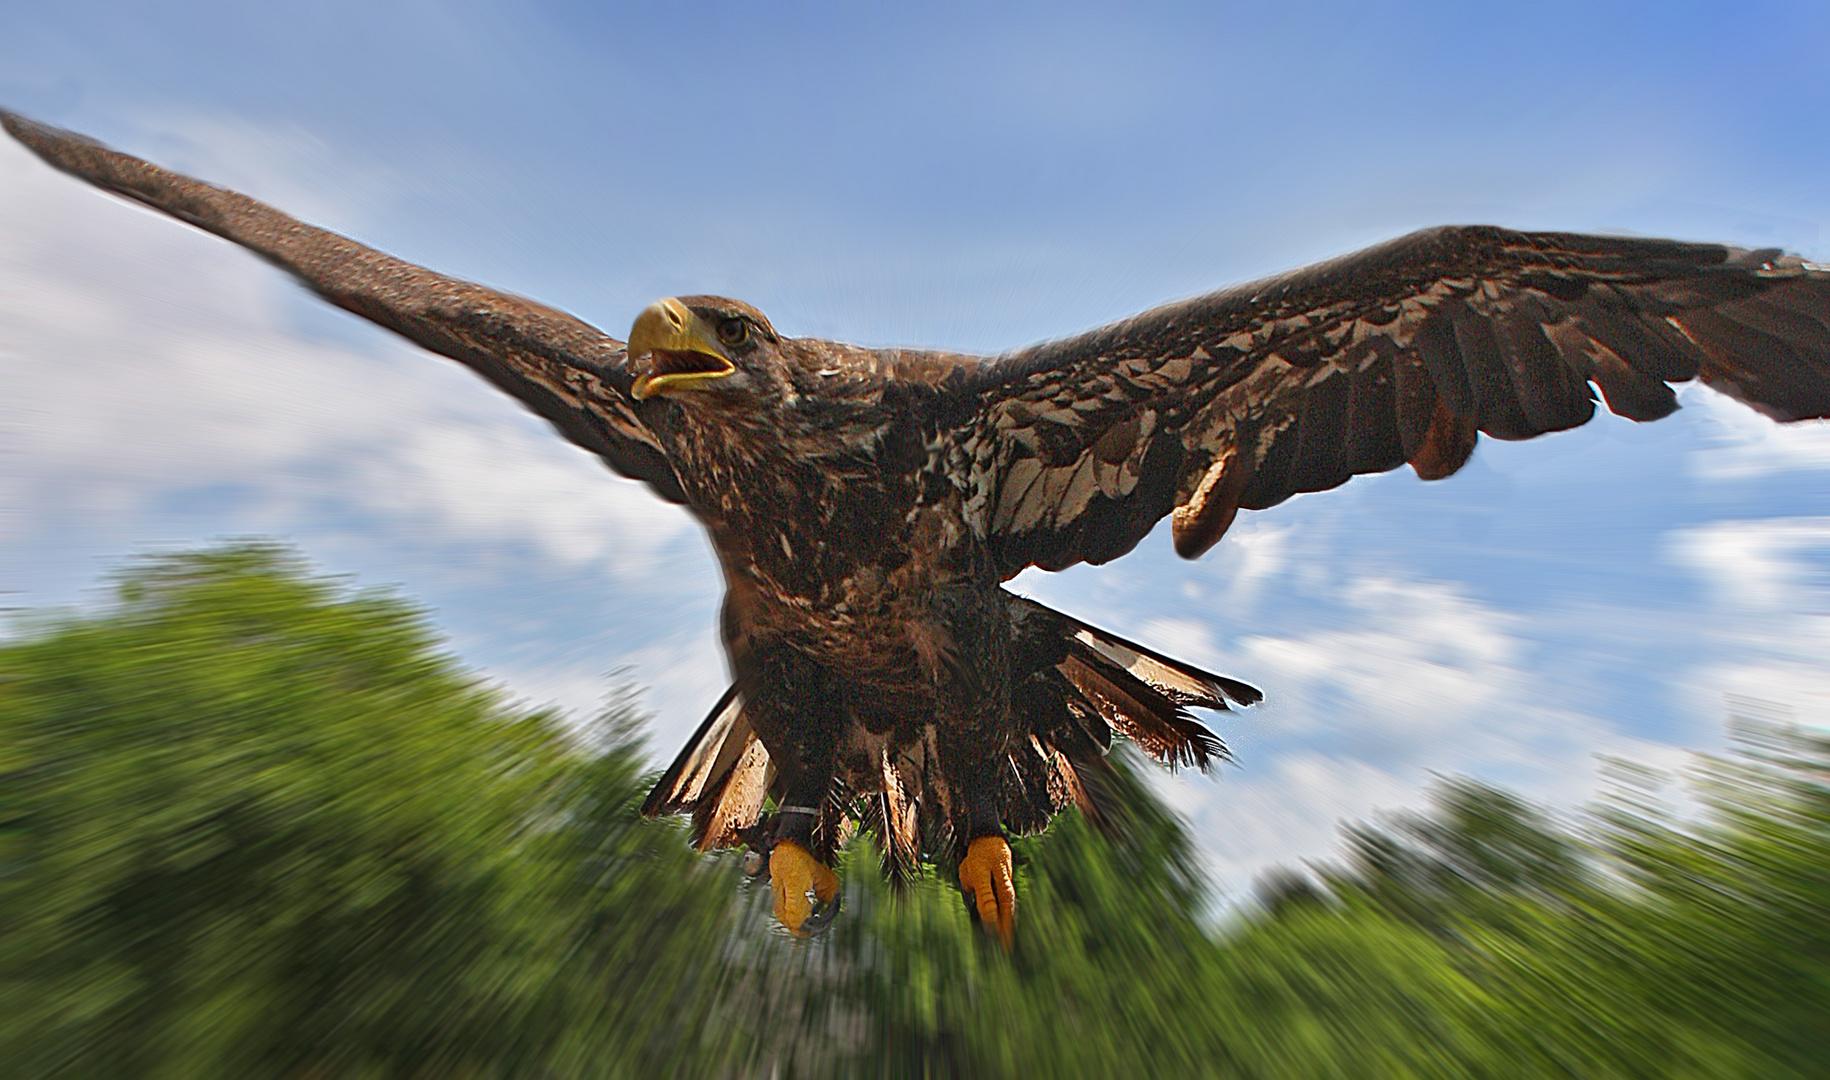 Junger Weisskopfseeadler im Flug